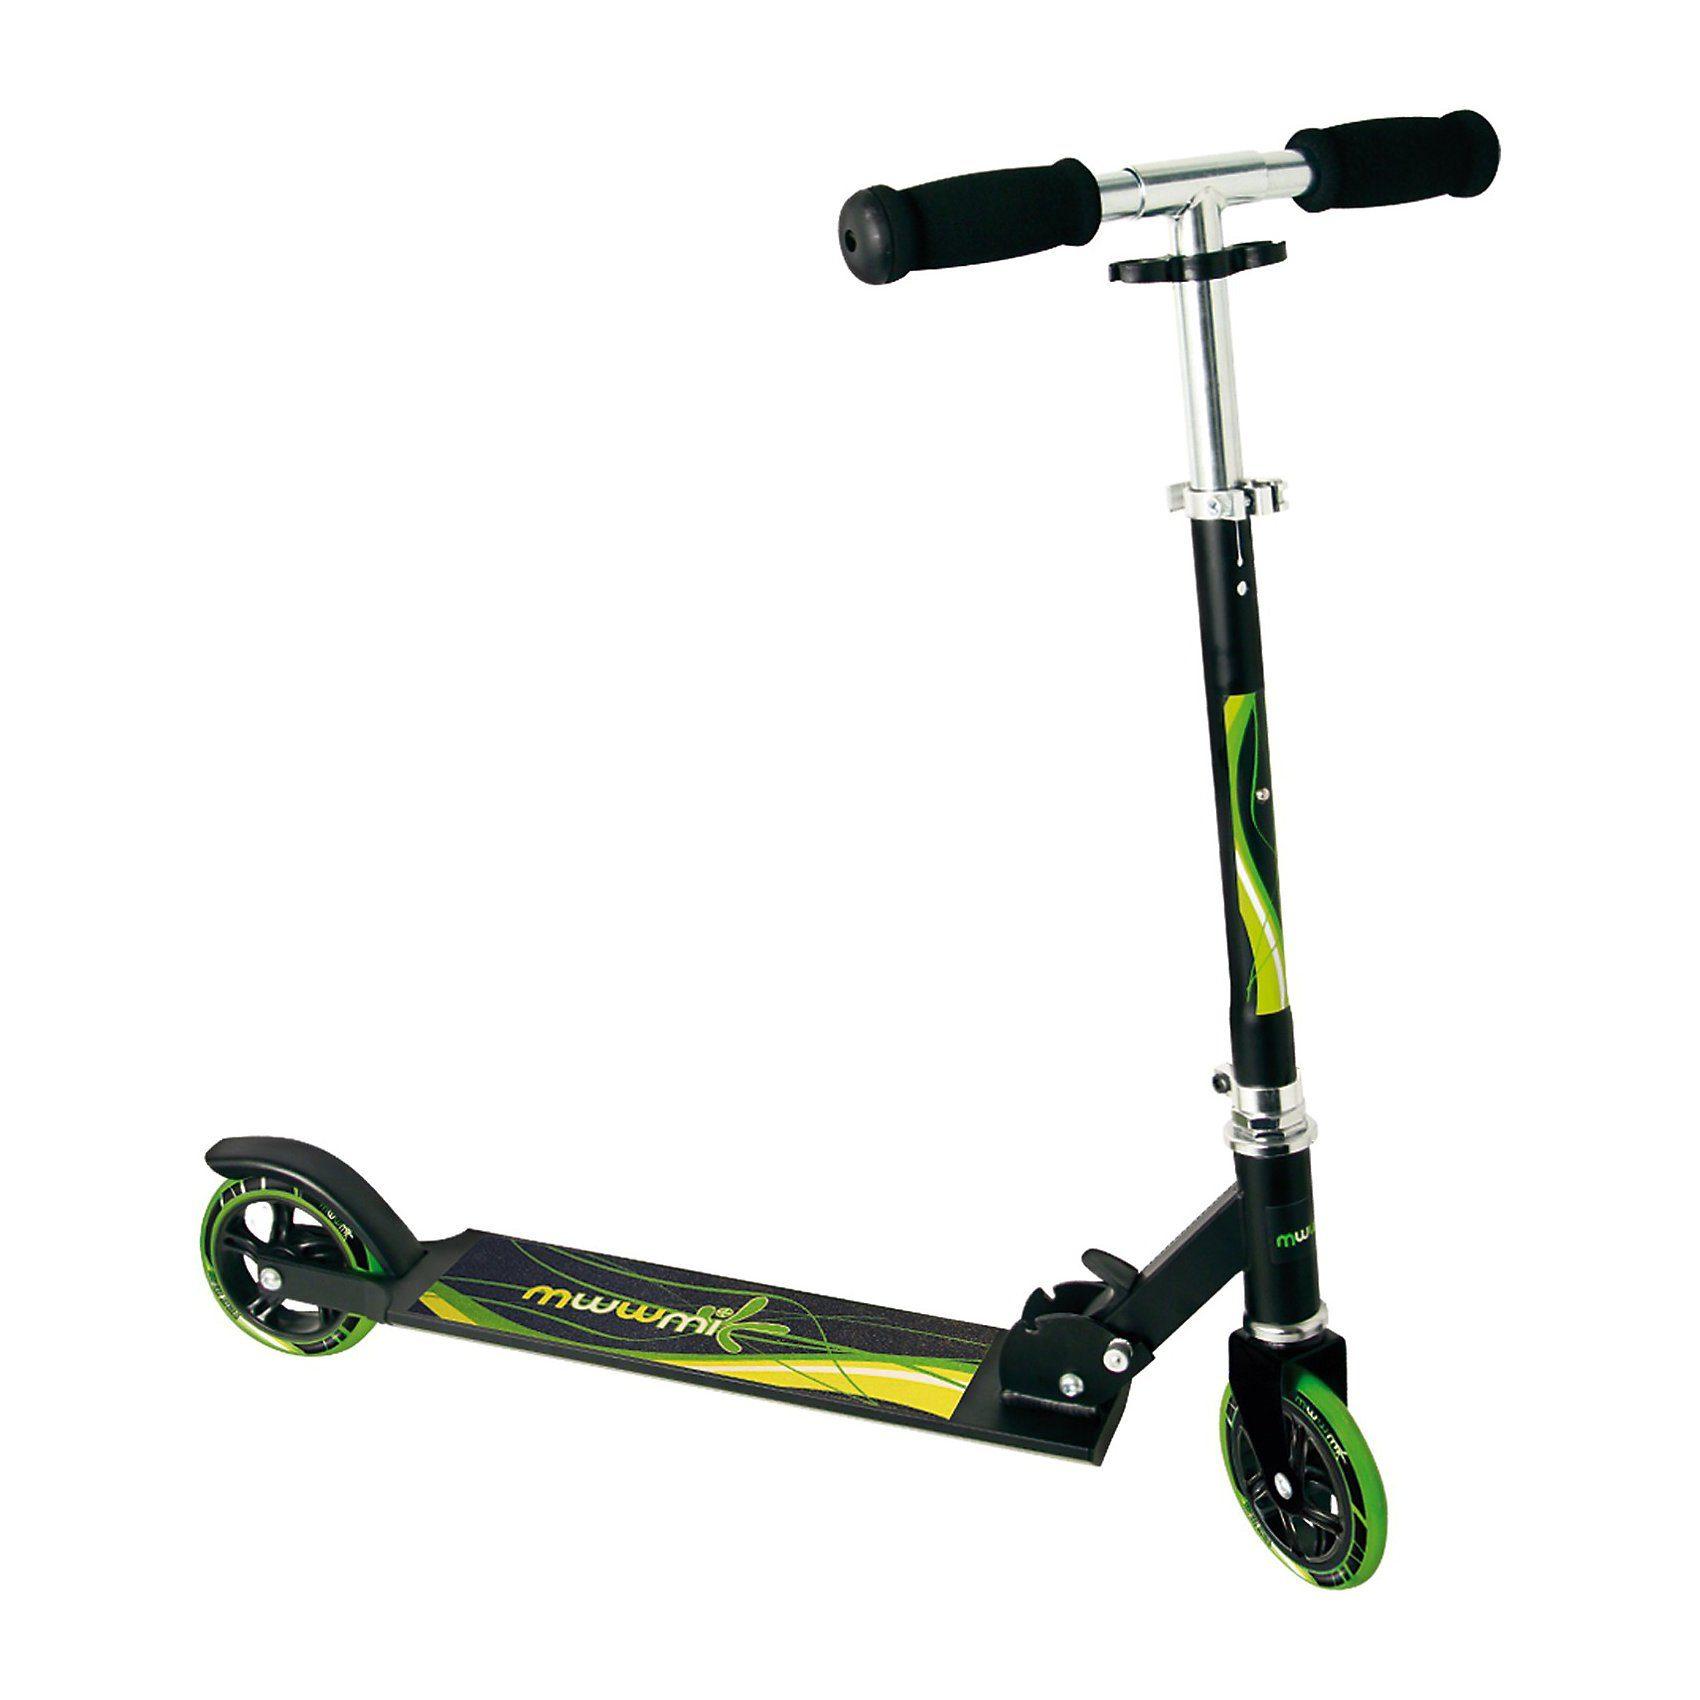 Muuwmi Scooter schwarz/grün 125 mm